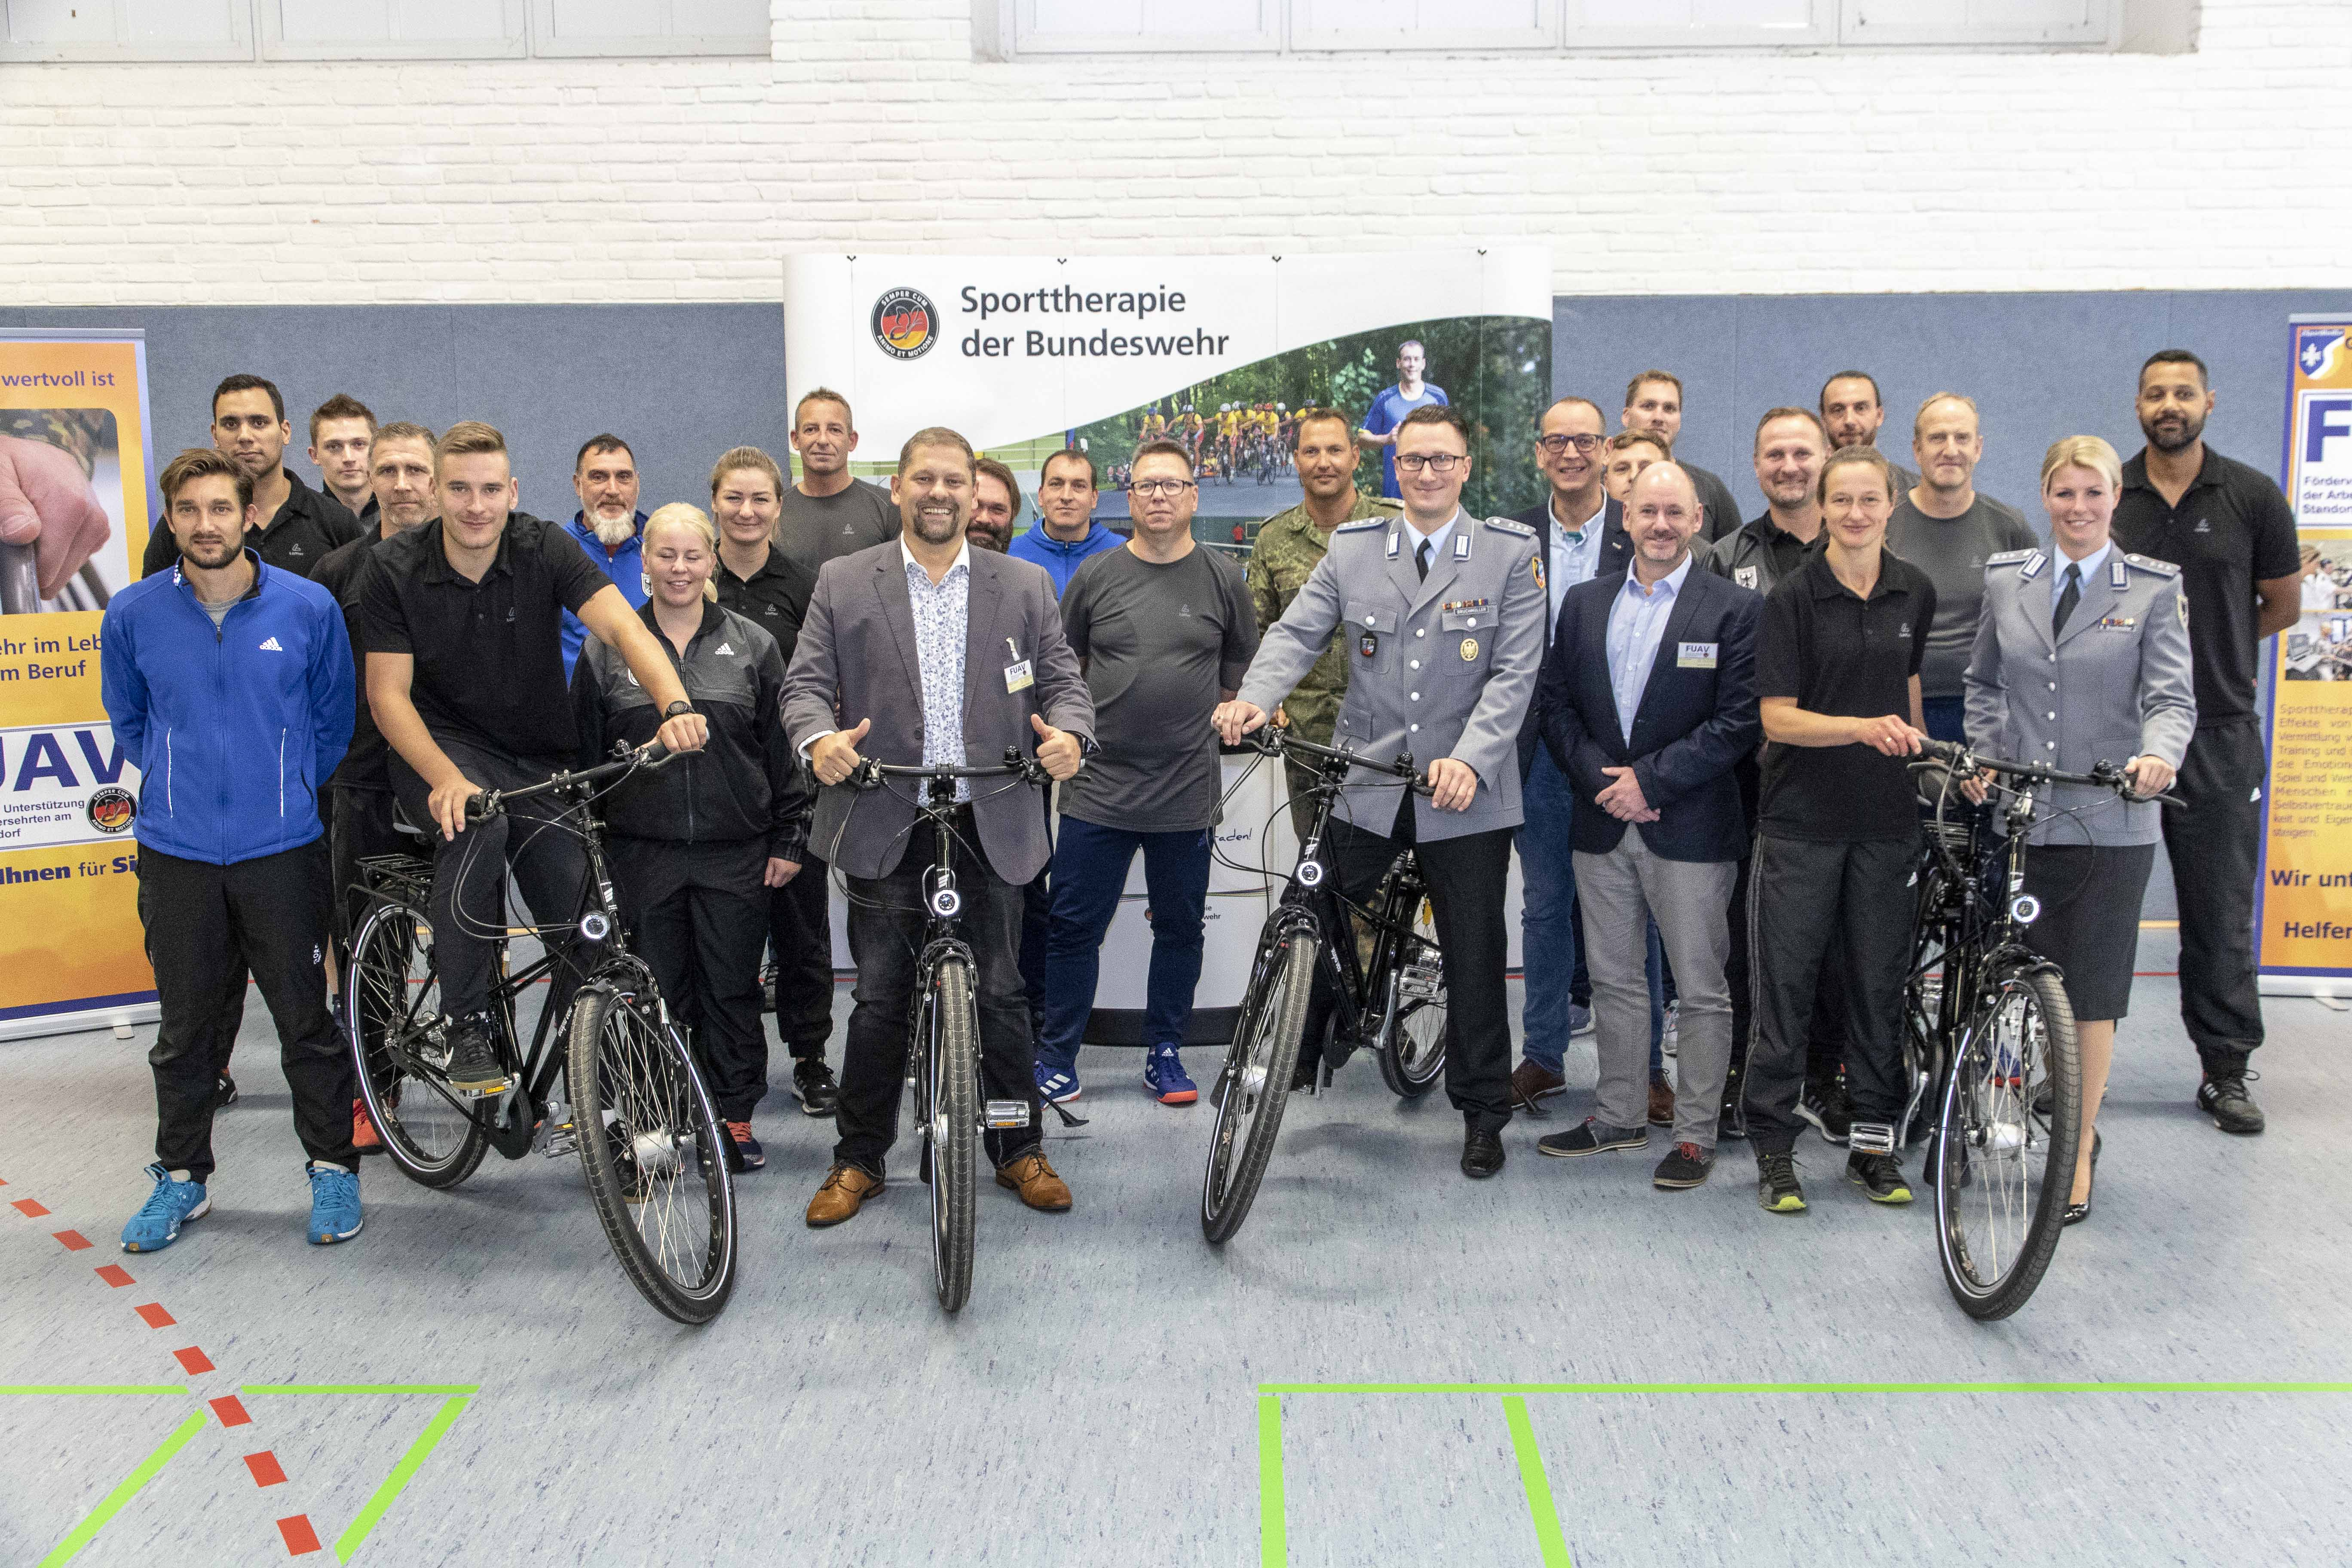 SportSBw/Hubert Kemper